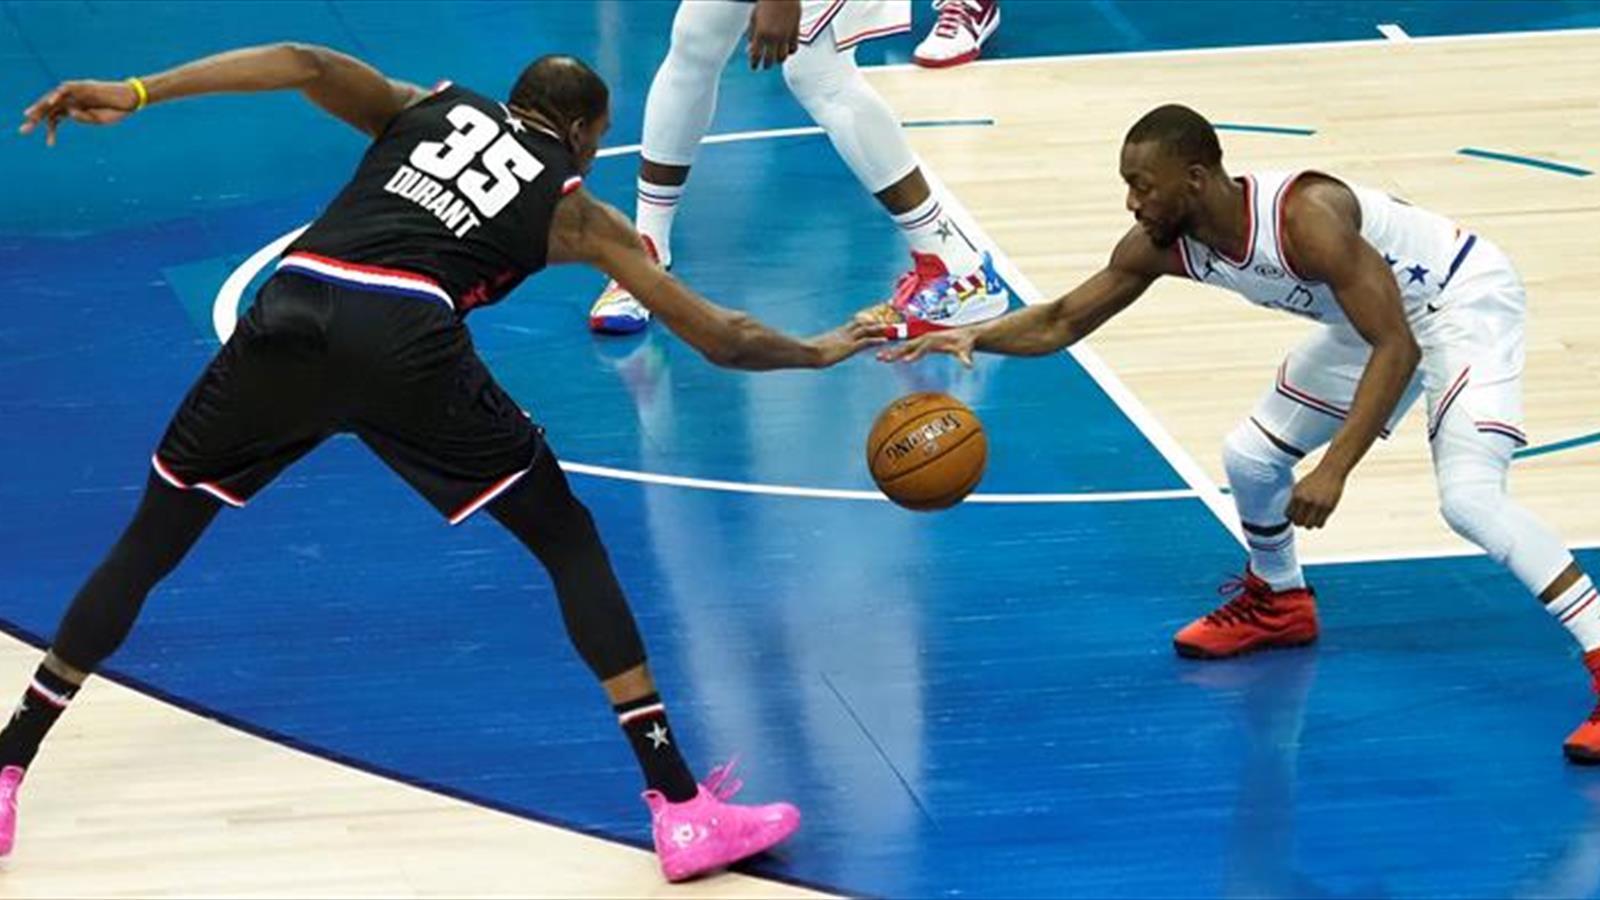 9097edfeb30cb All Star  Remontada del equipo de LeBron ante el de Antetokounmpo con un  Durant MVP (178-164)